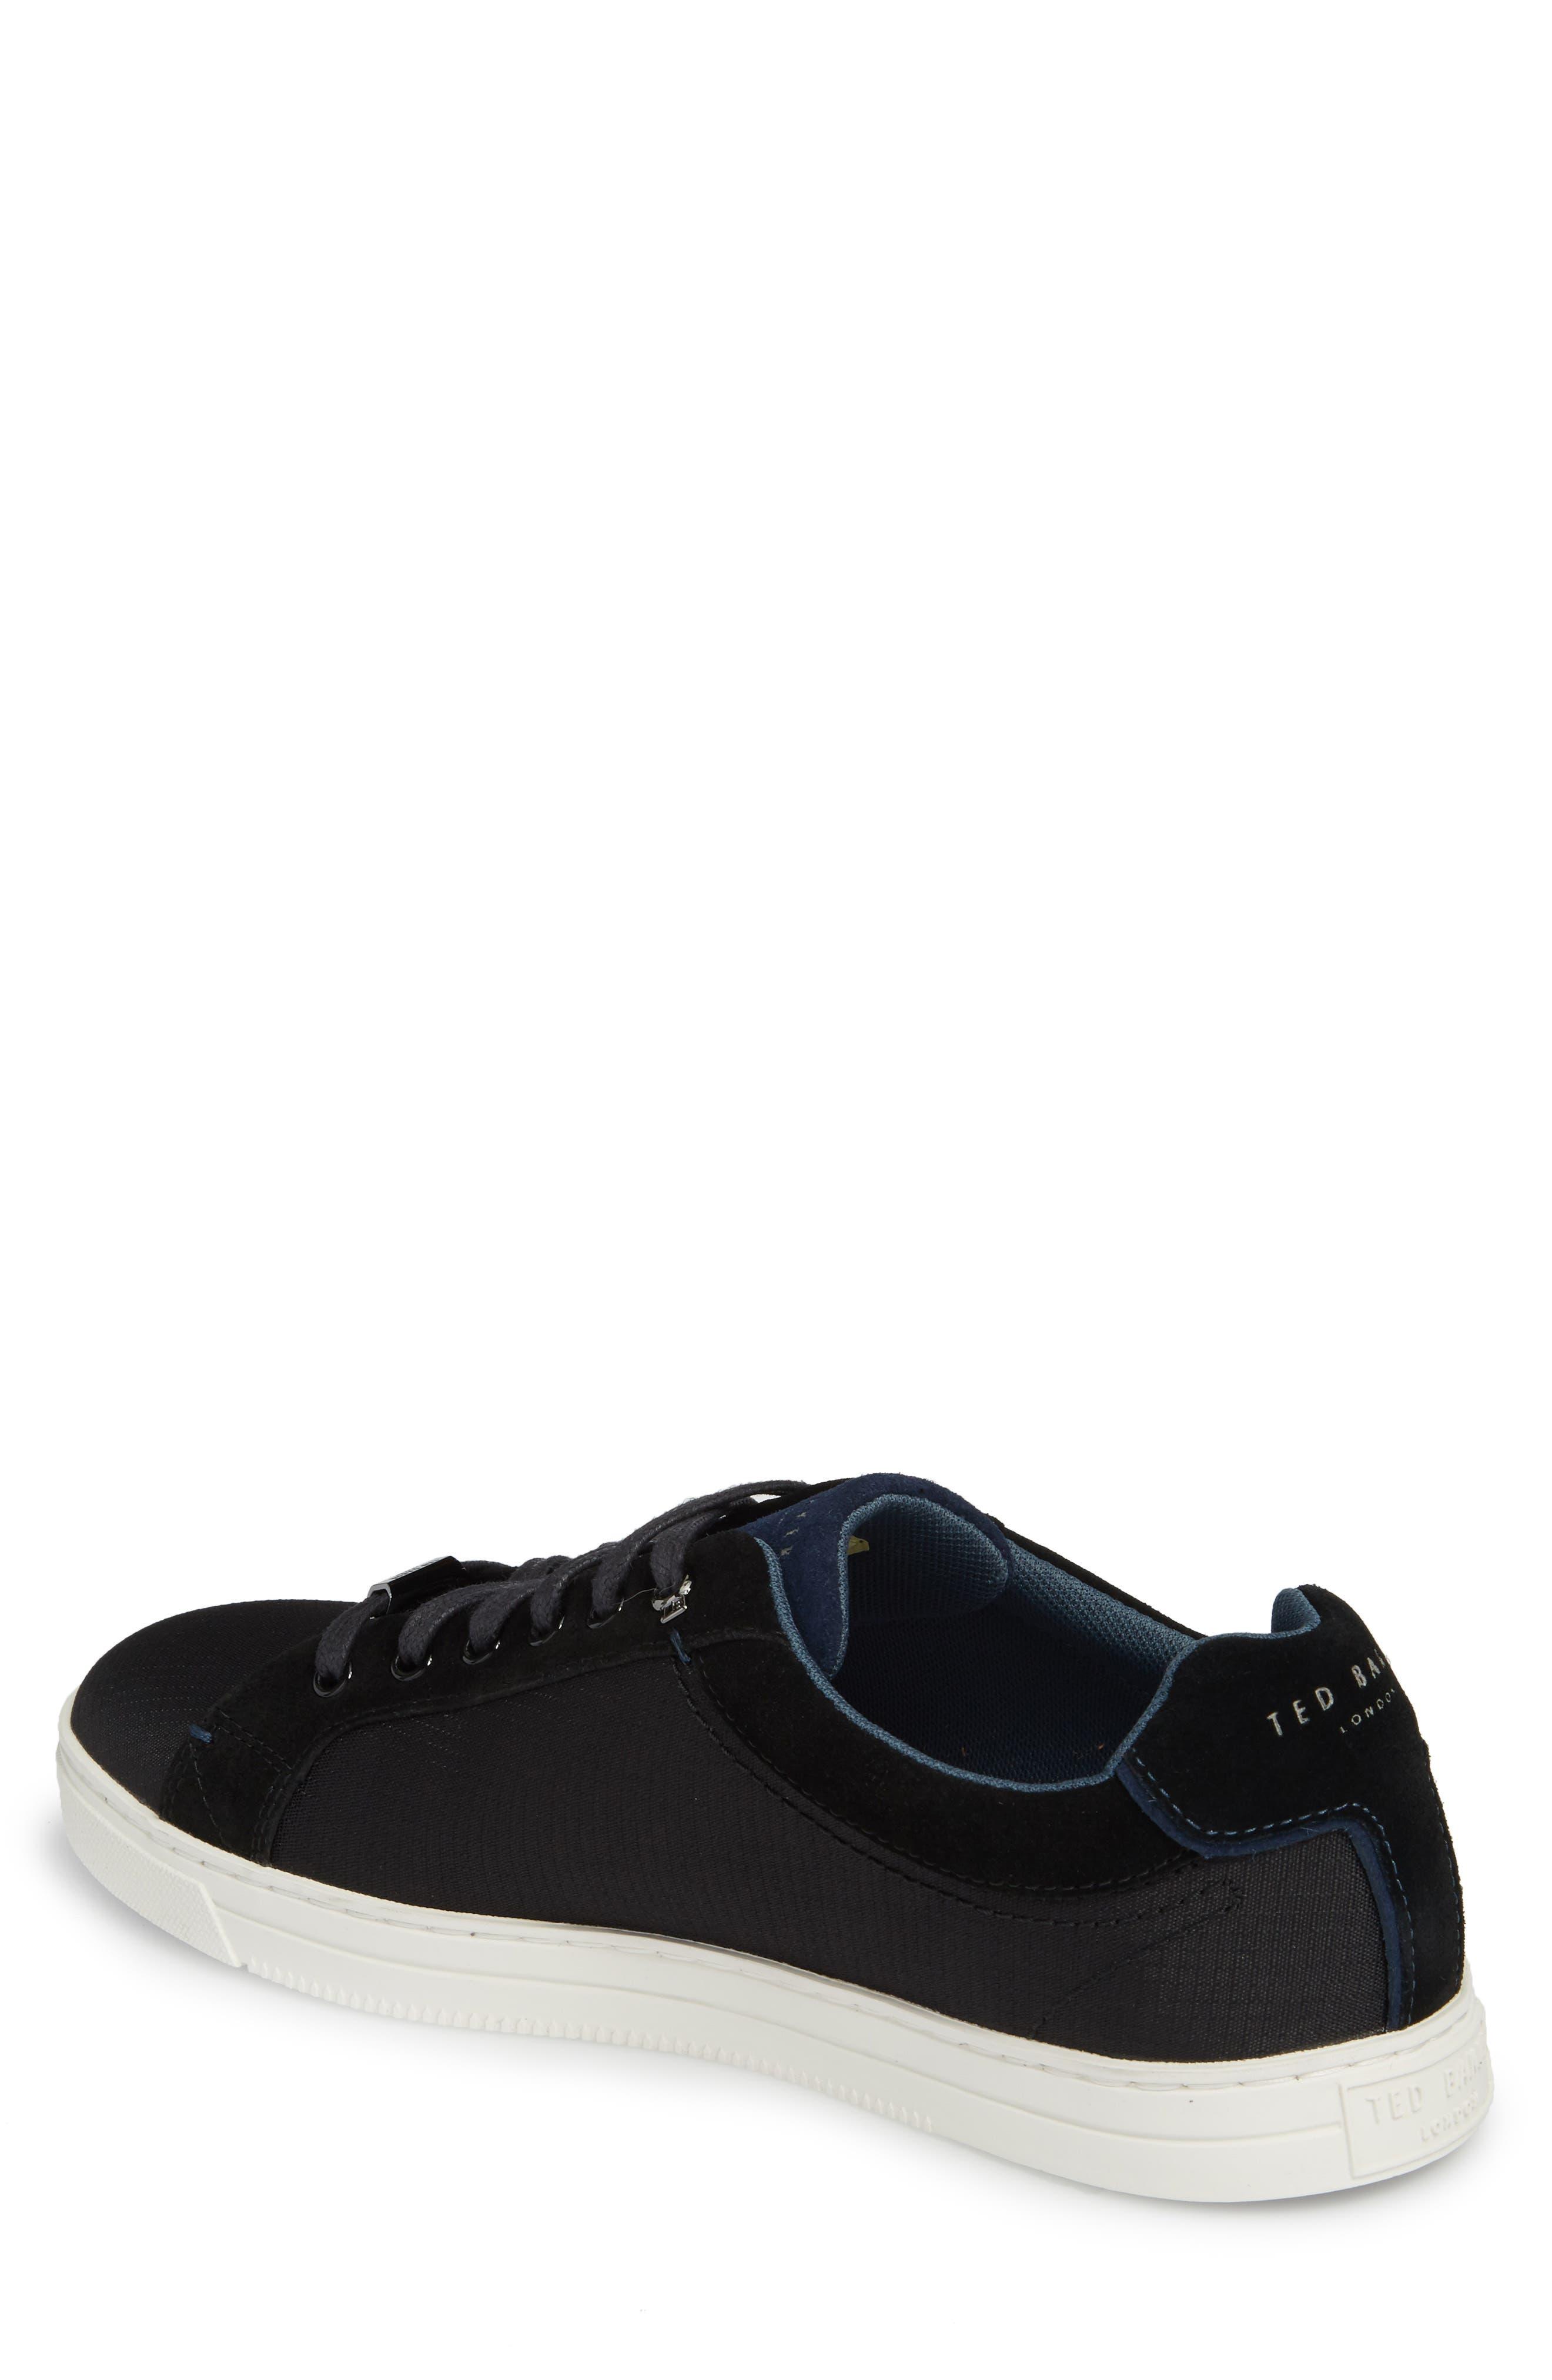 Klemes Sneaker,                             Alternate thumbnail 2, color,                             Black Textile